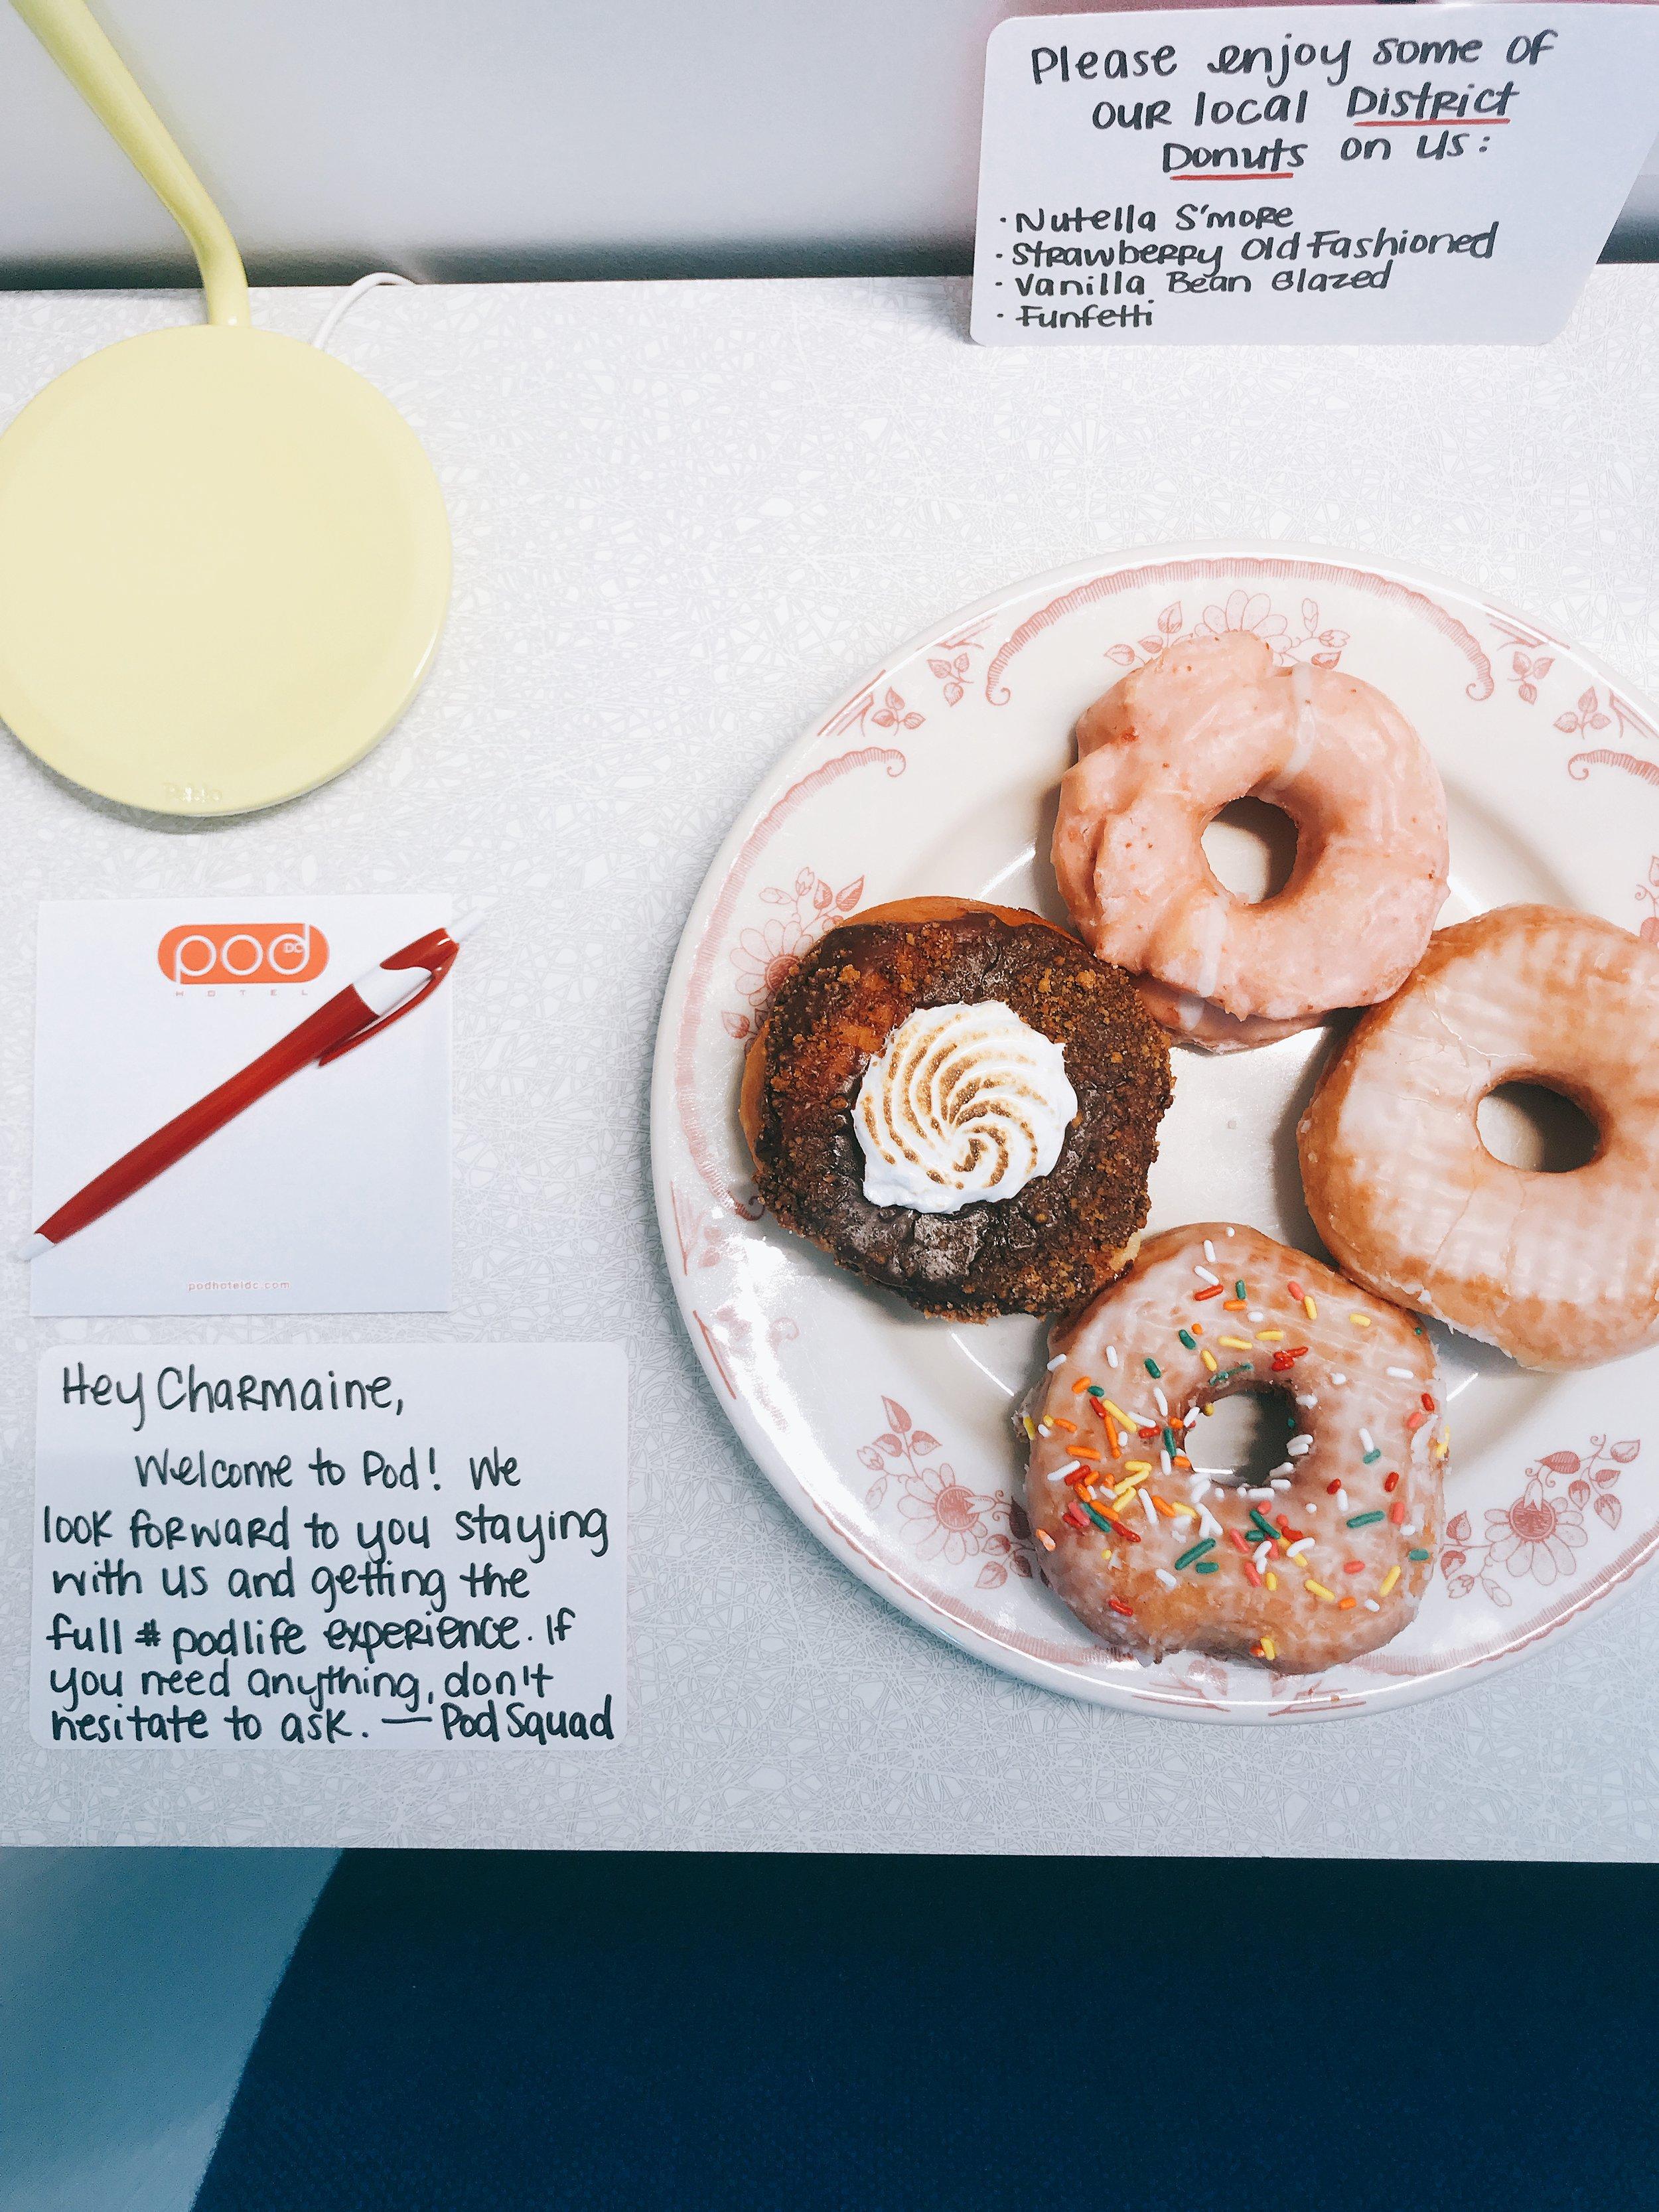 District Doughnuts